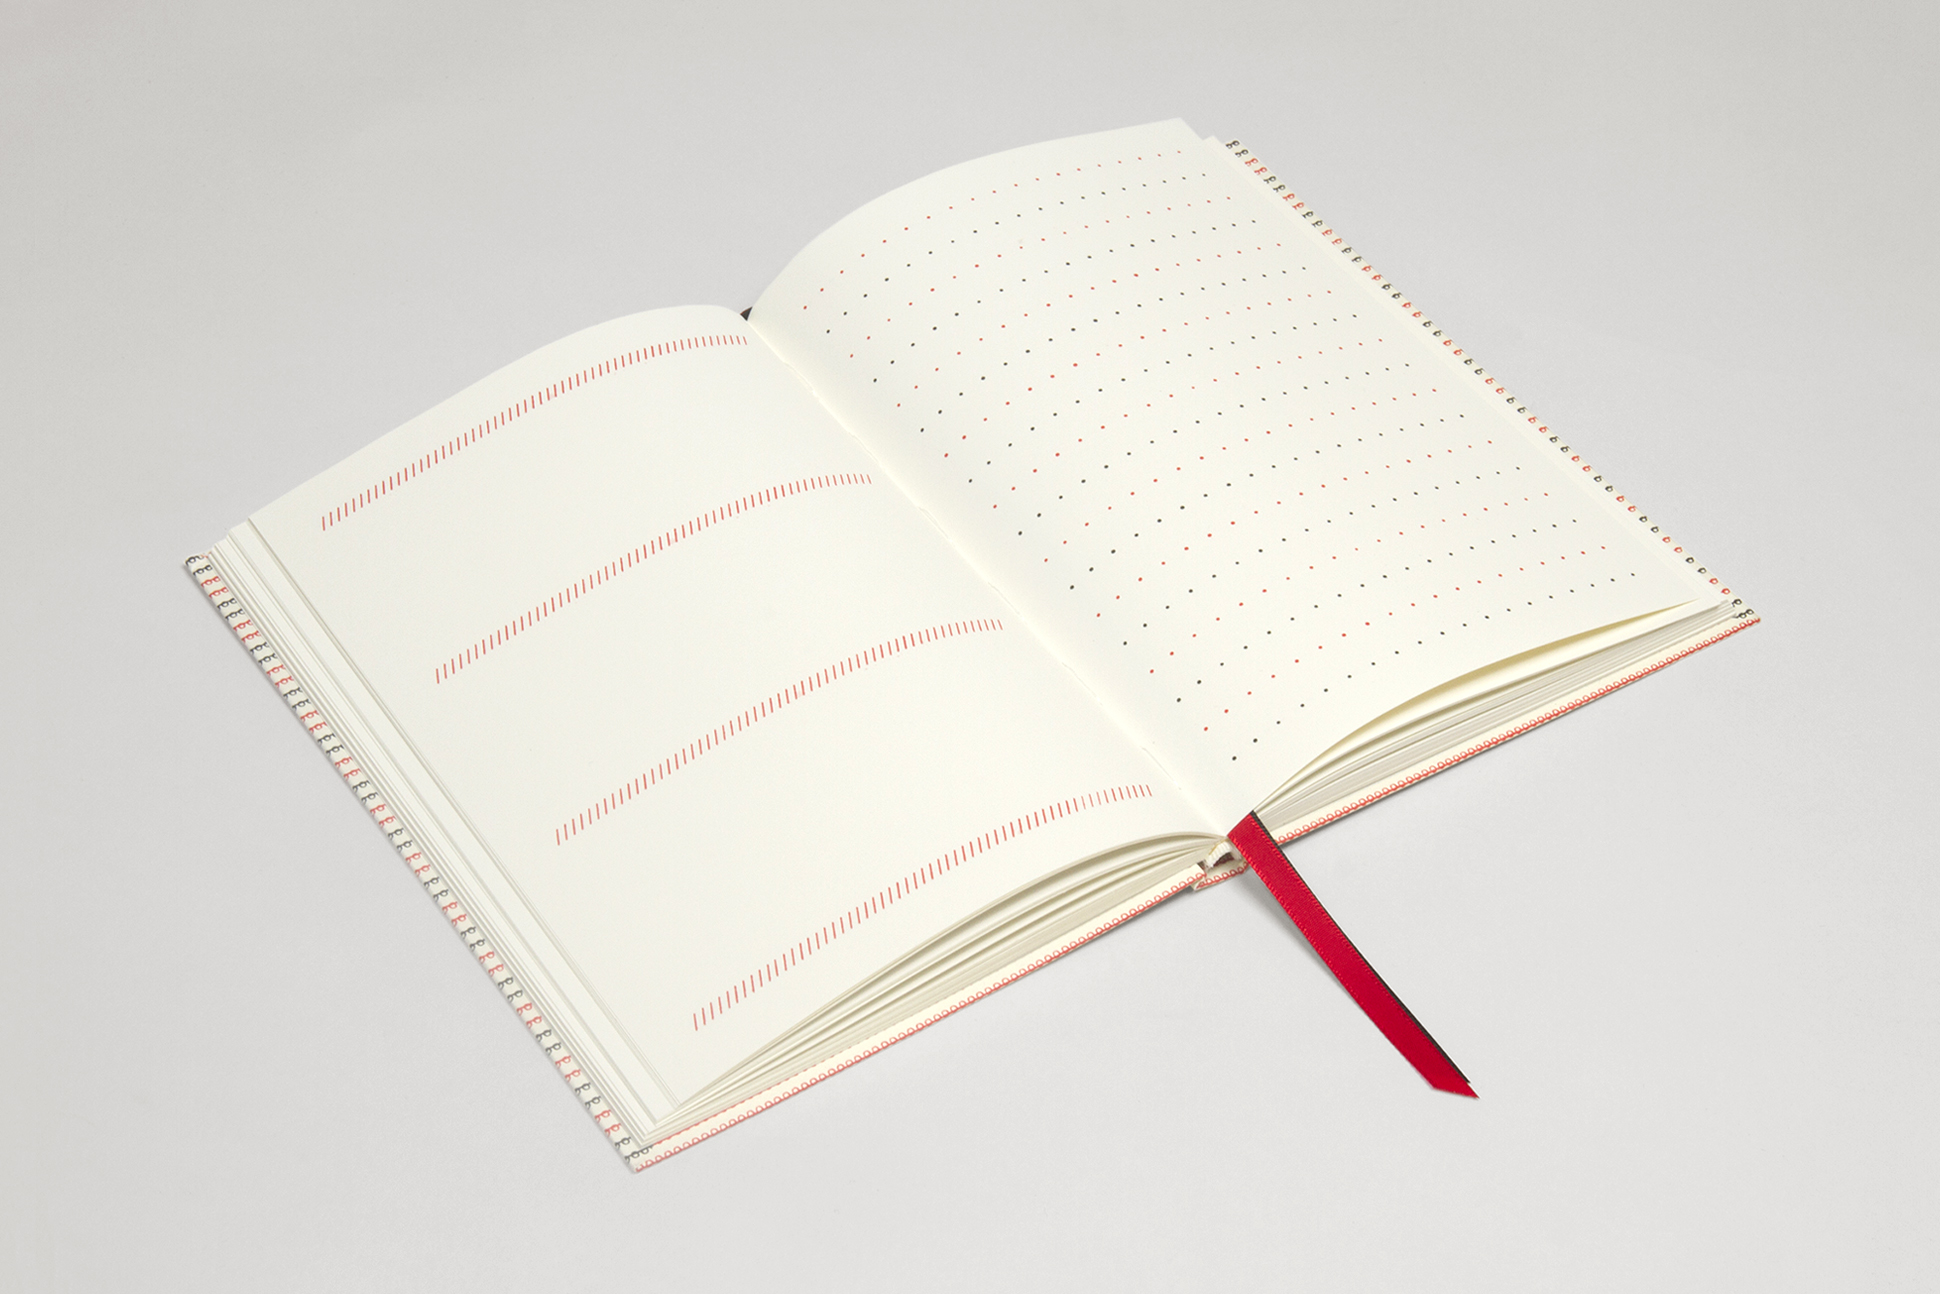 olivetti notebook 3